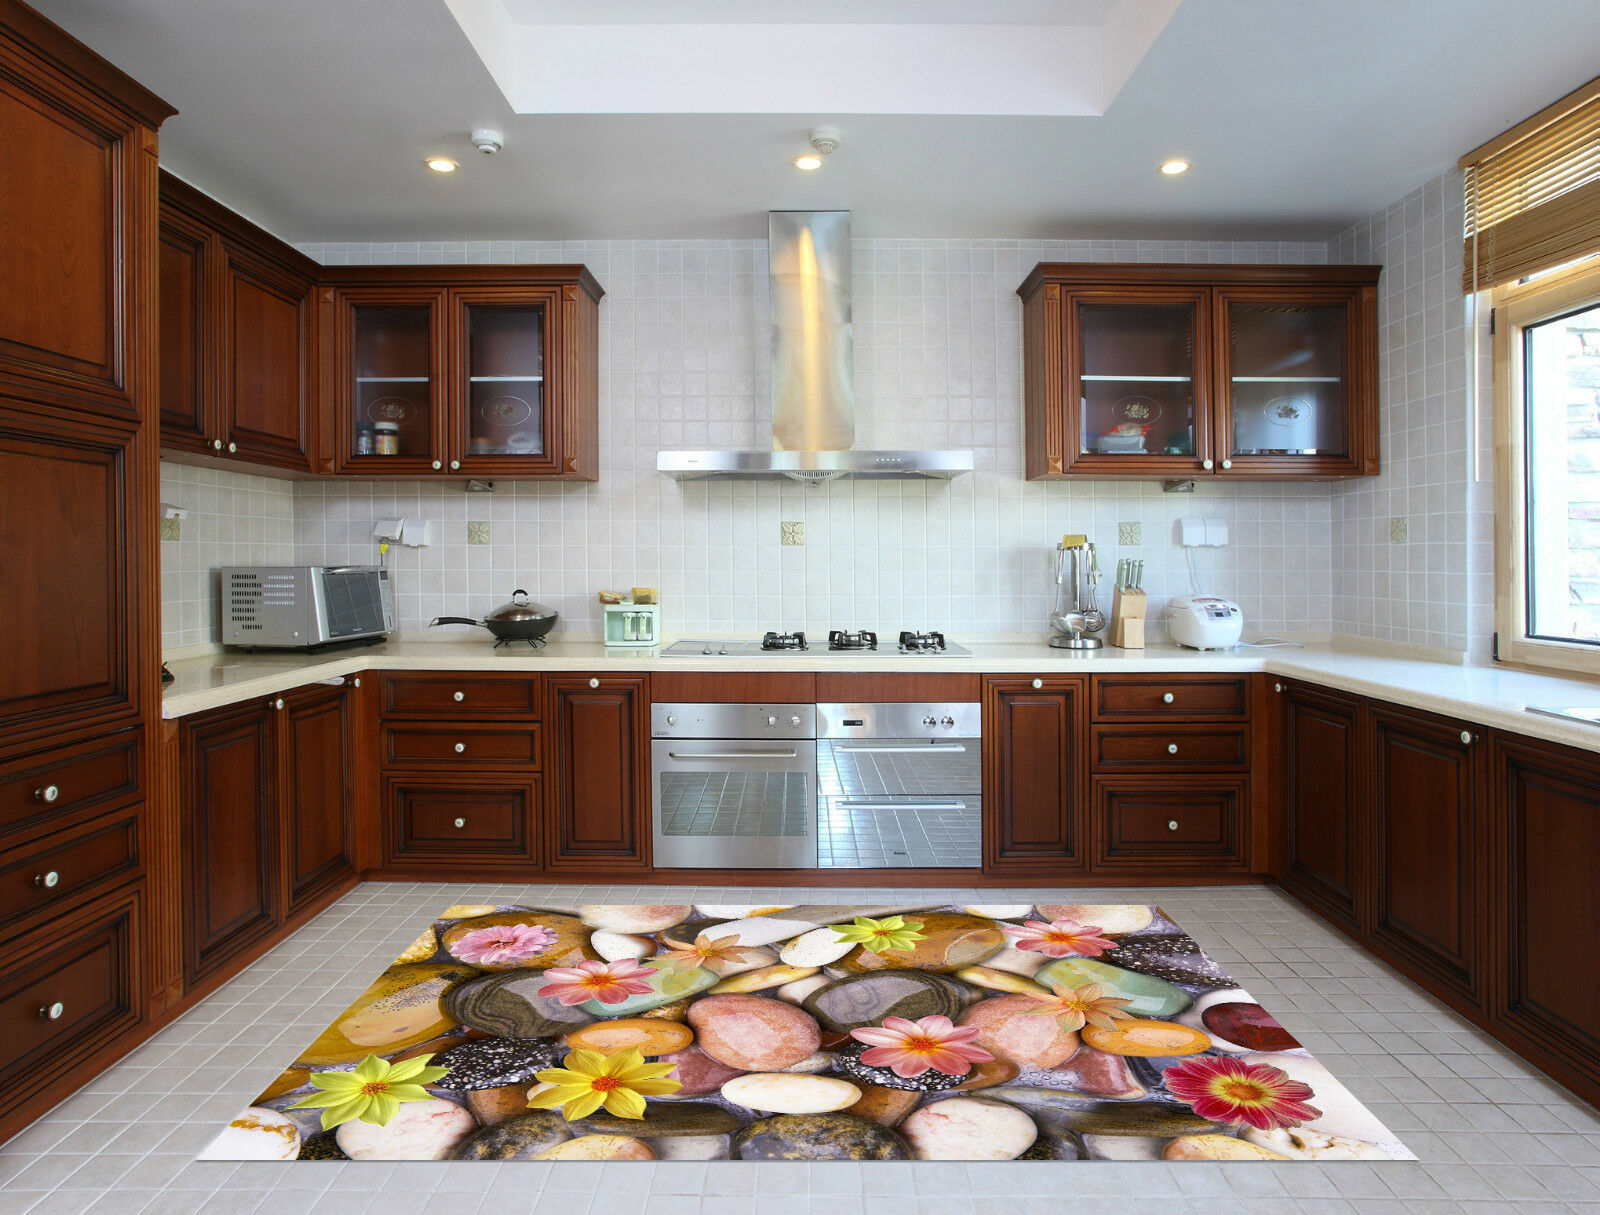 3D Flower Stone 5 Kitchen Mat Floor Murals Wall Print Wall Deco AJ WALLPAPER CA